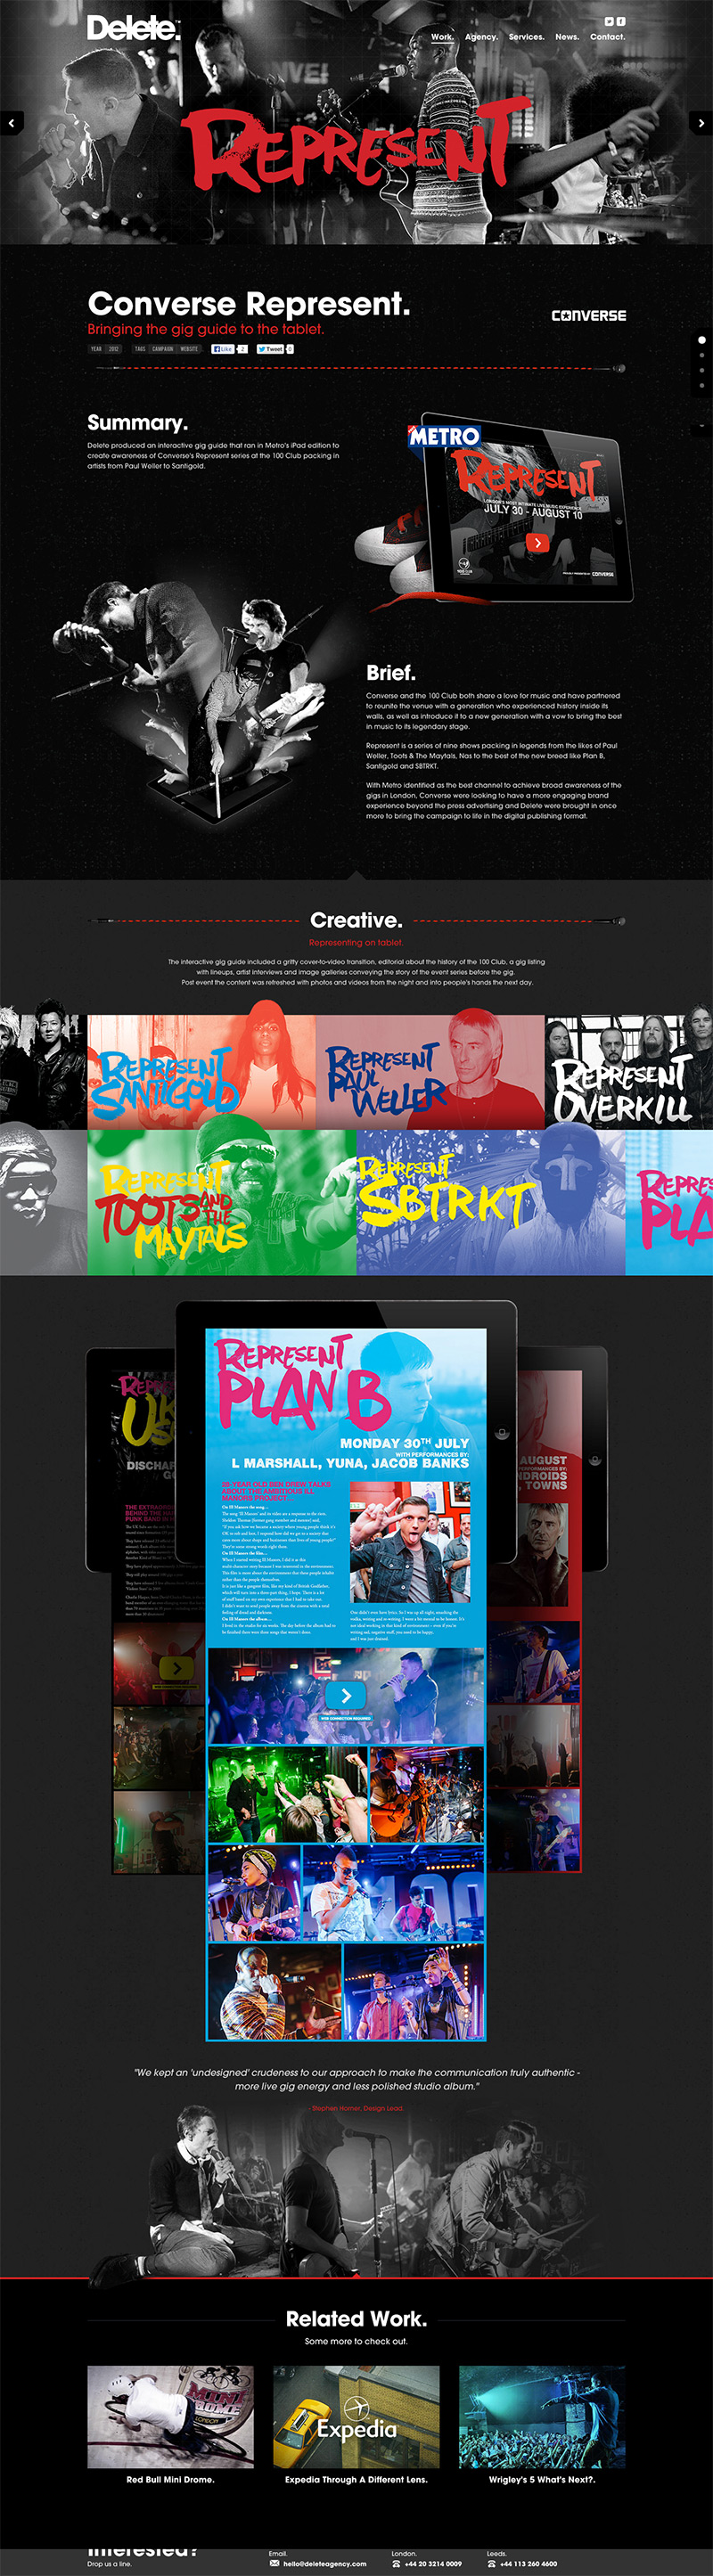 Unique Web Design, Delete @MadeByEricaMade #WebDesign #Design (http://www.pinterest.com/aldenchong/)